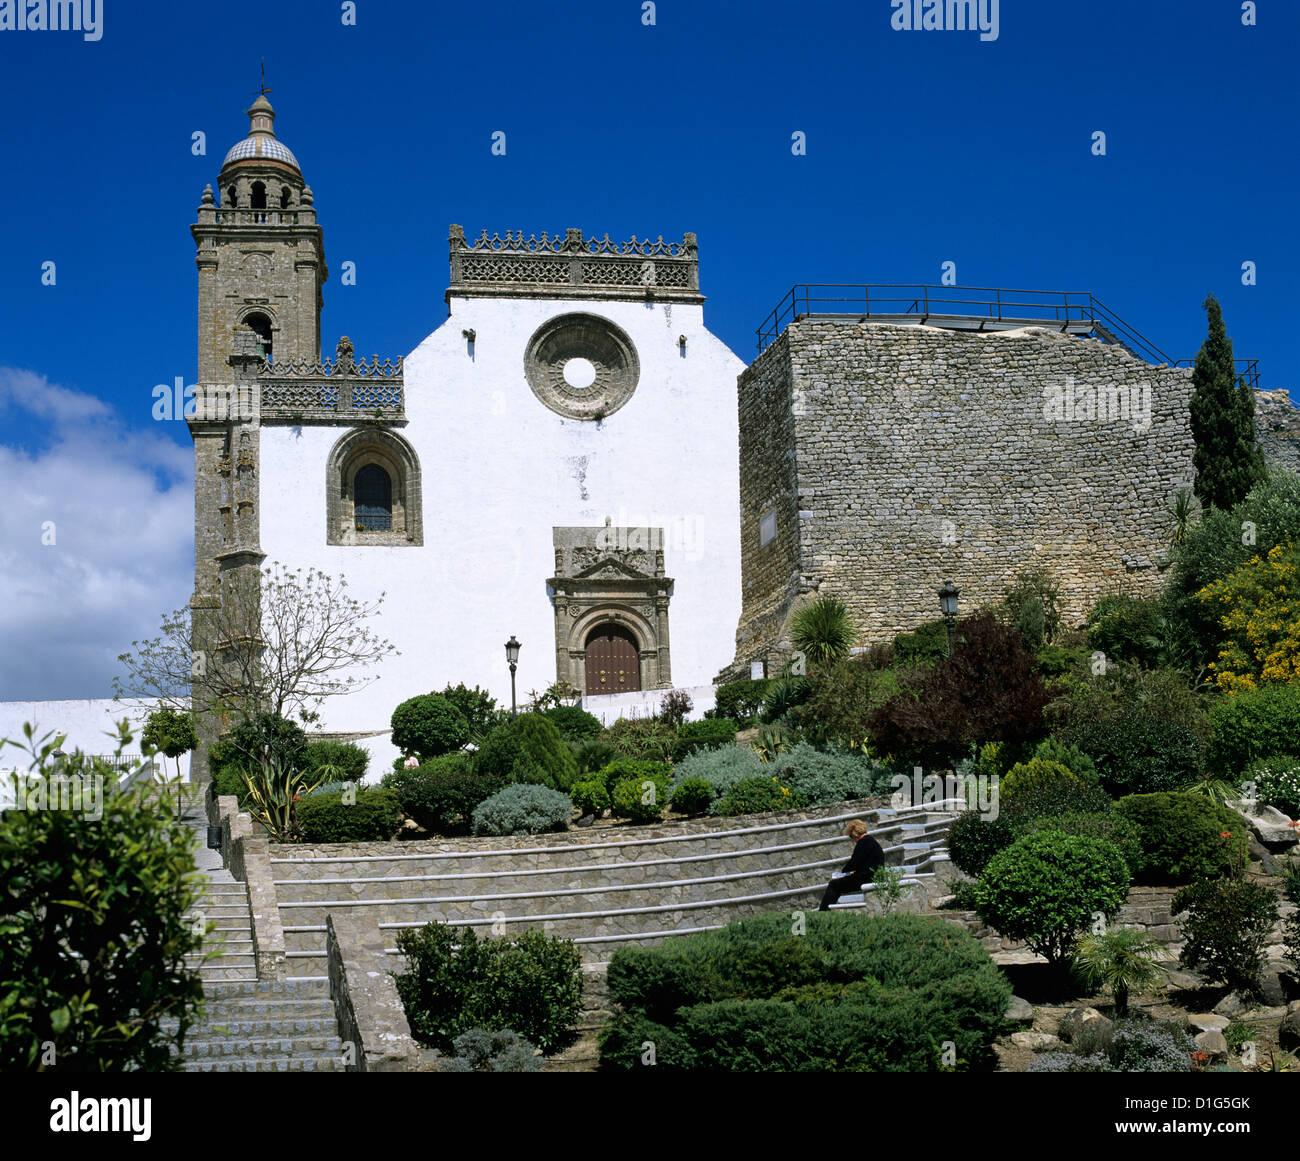 Plaza Iglesia Mayor and the church of Santa Maria la Coronada, Medina Sidonia, Andalucia, Spain, Europe - Stock Image